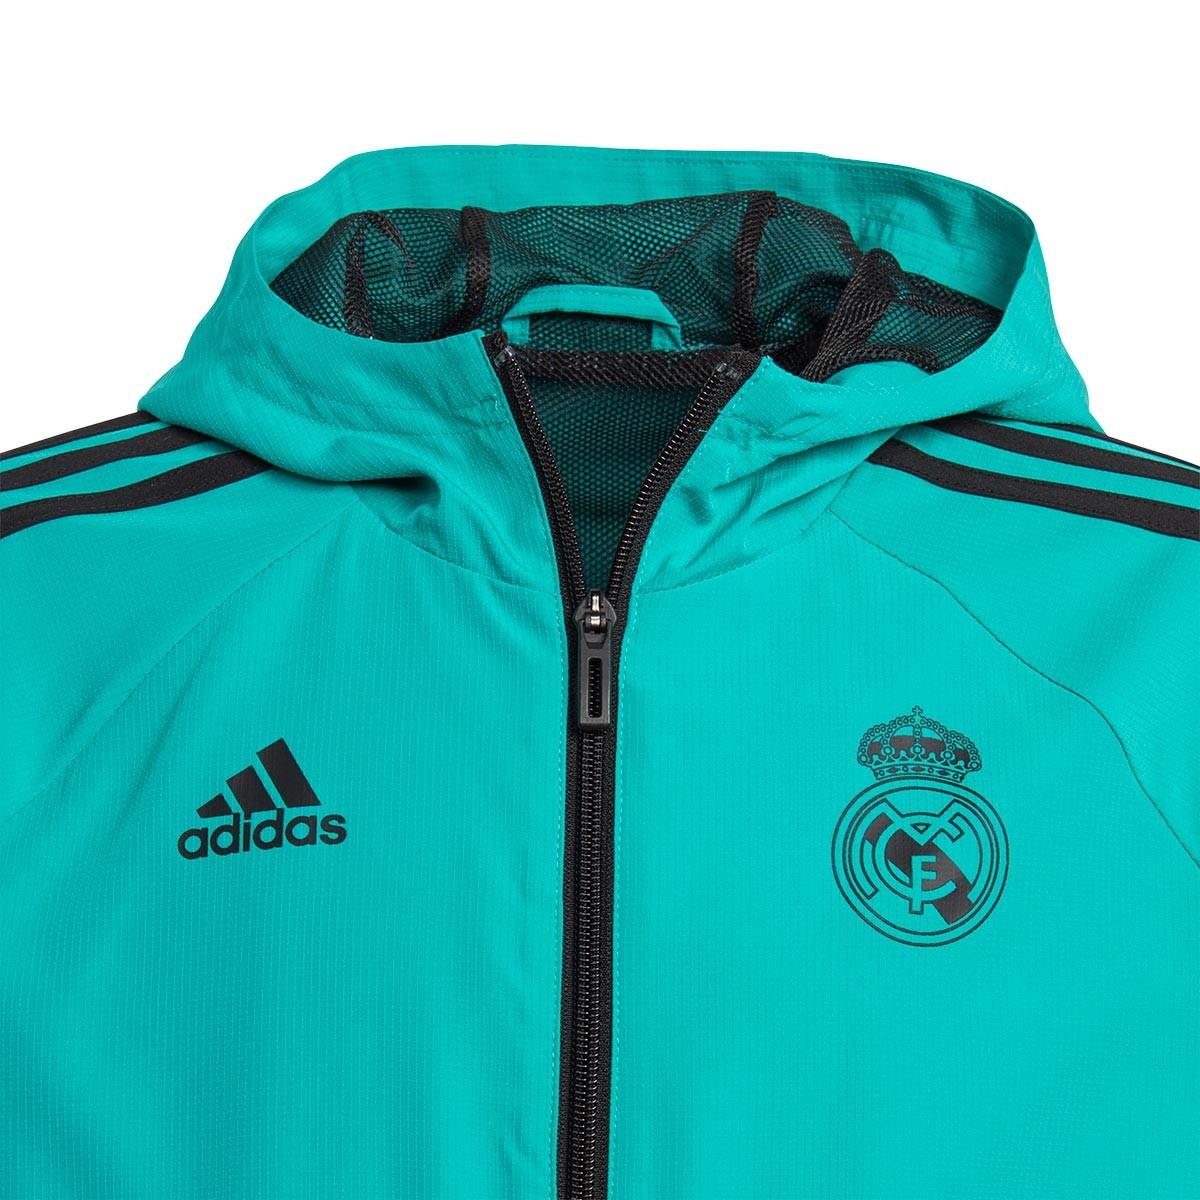 4e55dbad93f39 Jacket adidas Kids Pre Match Real Madrid 2017-2018 Aero green-Black -  Football store Fútbol Emotion